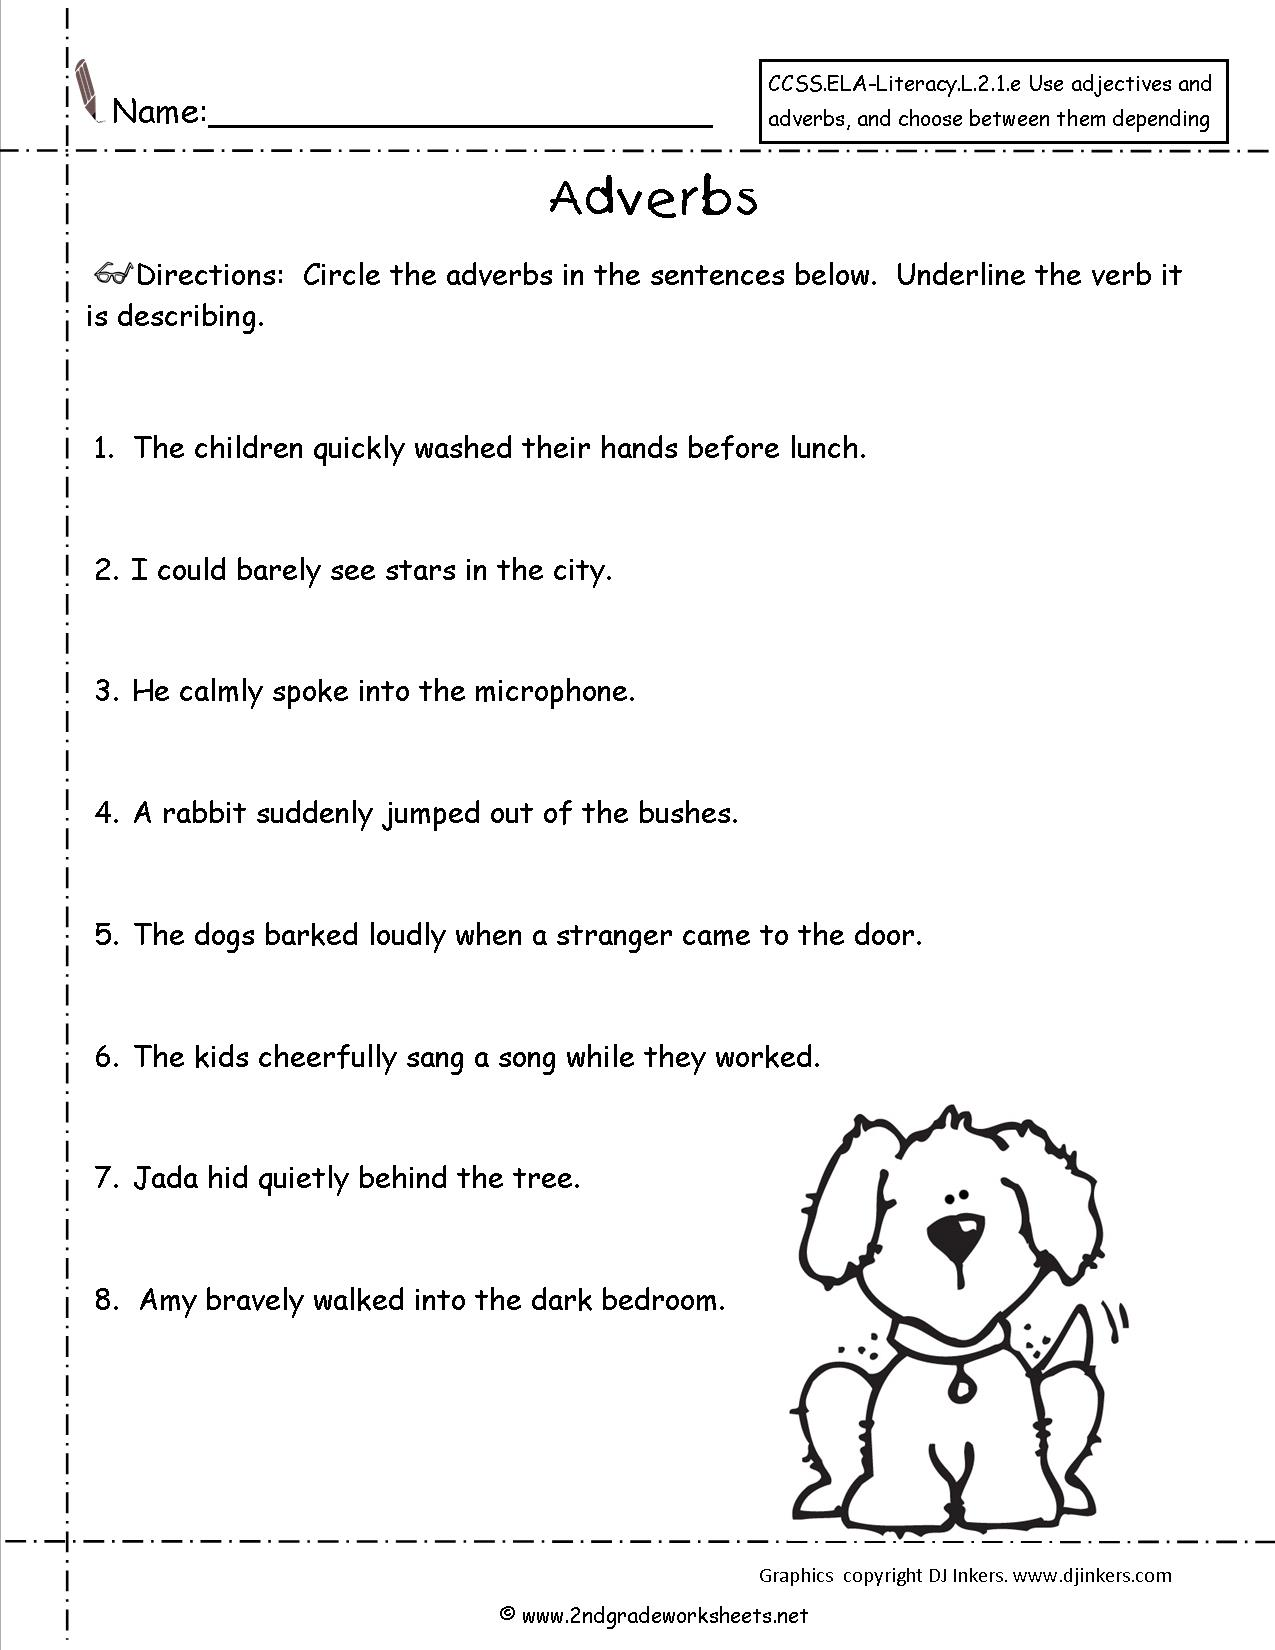 18 Best Images Of Adjectives Worksheets For Grade 2